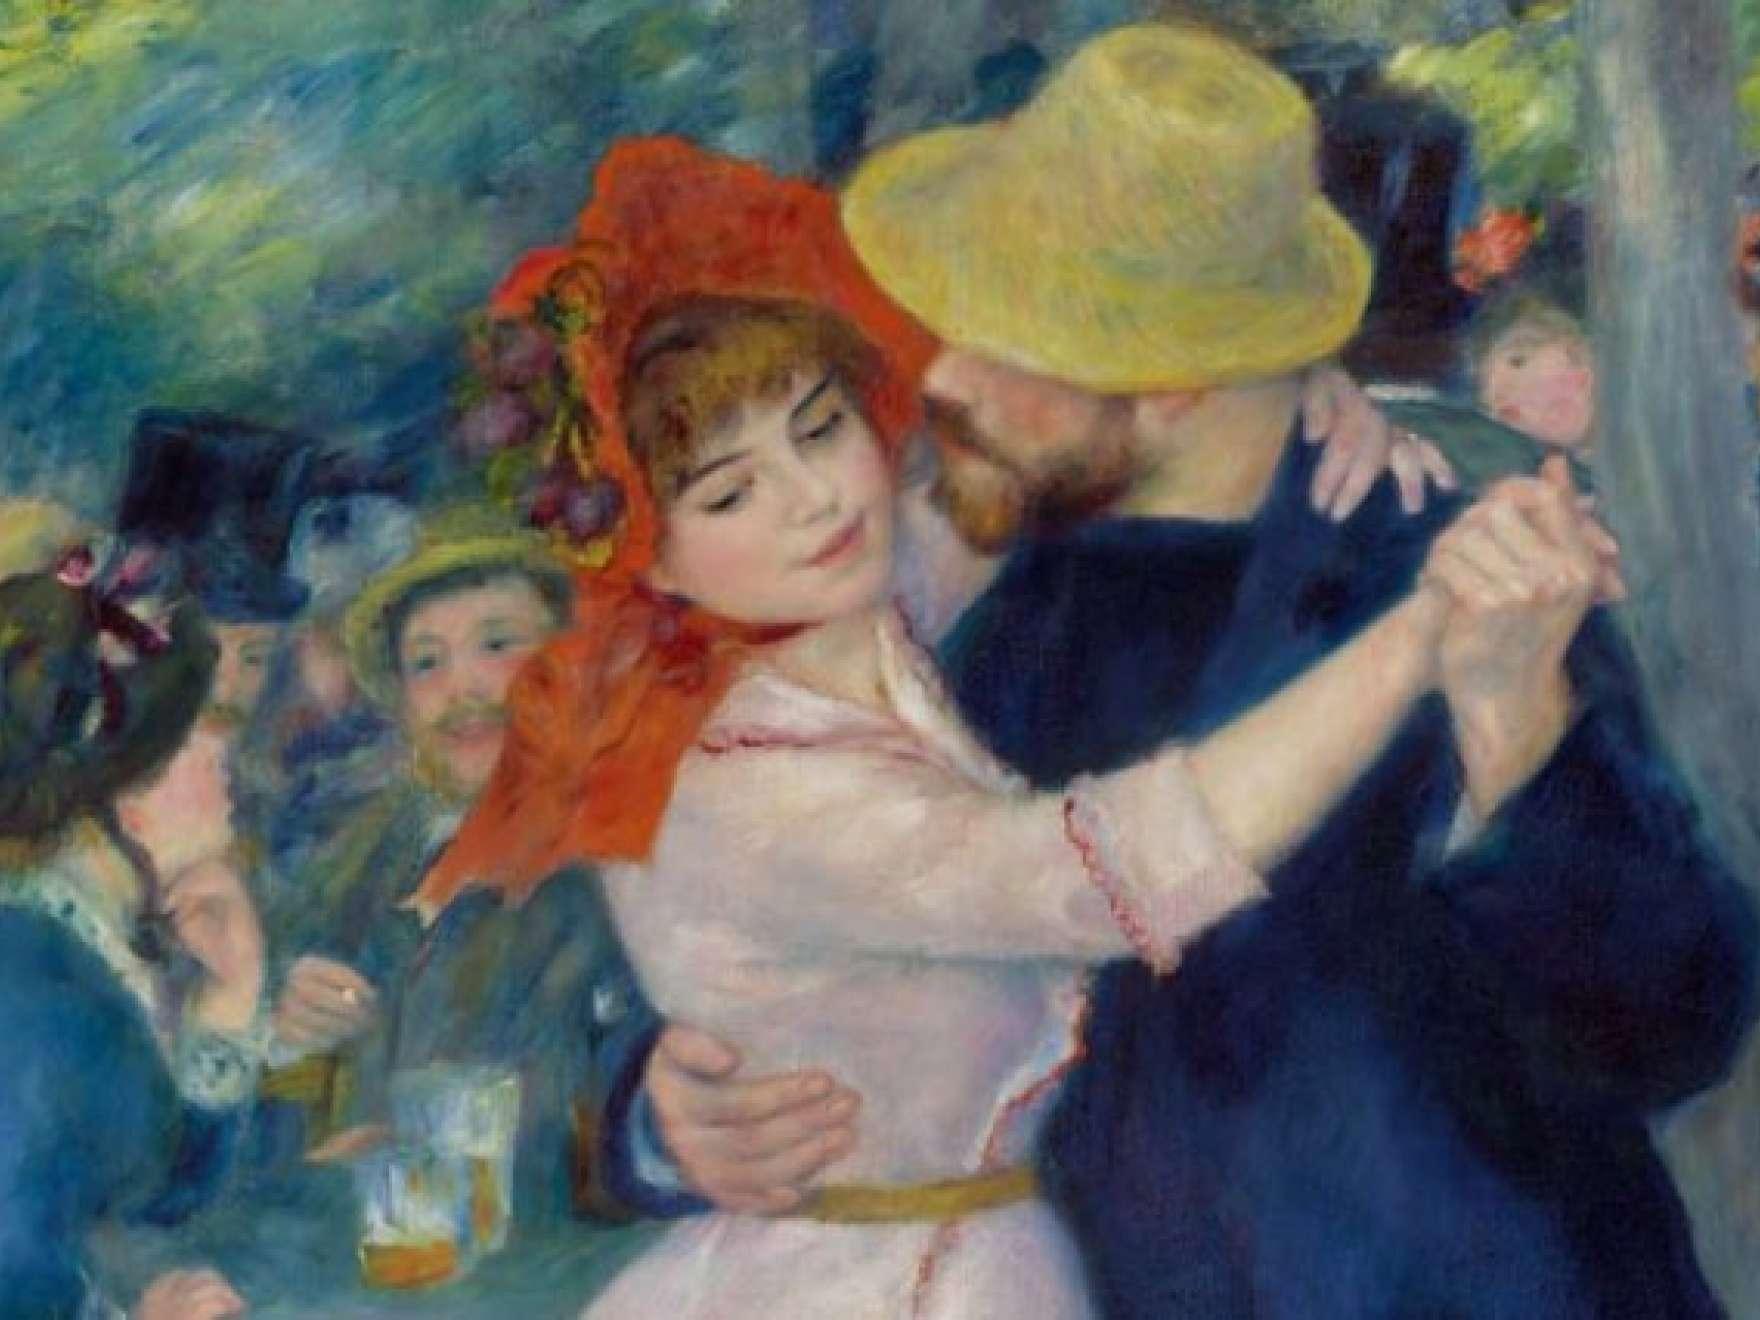 Pierre-Auguste Renoir, Dance at Bougival, 1883